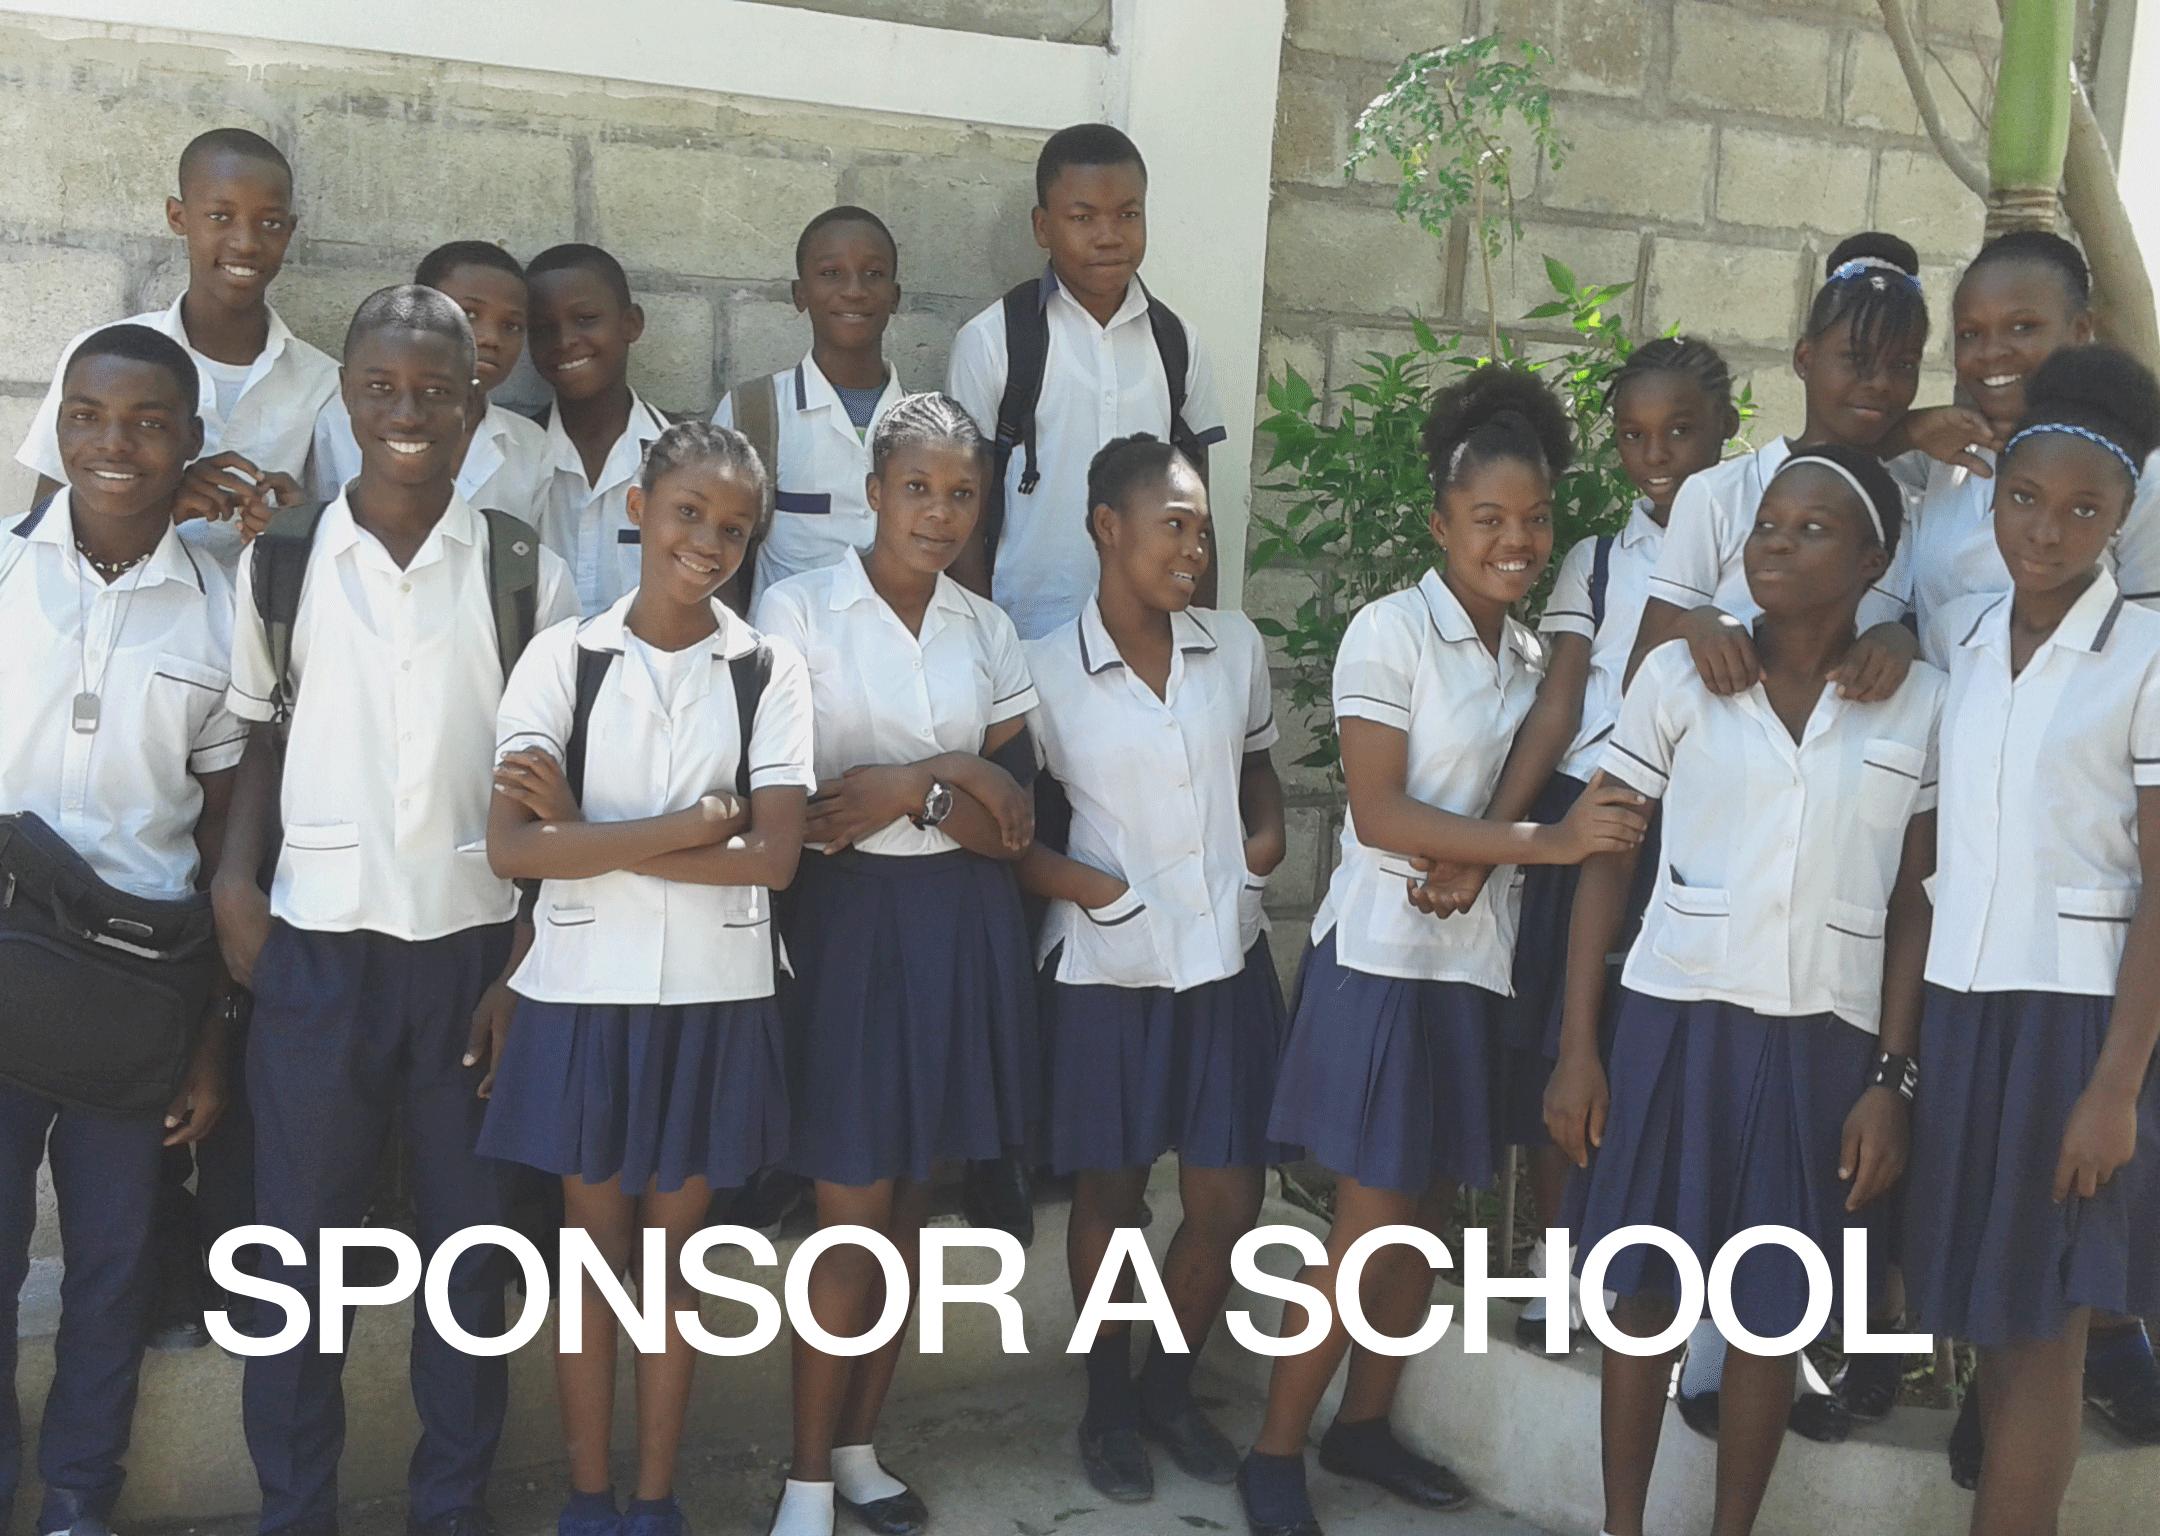 SPONSOR-A-SCHOOL.png